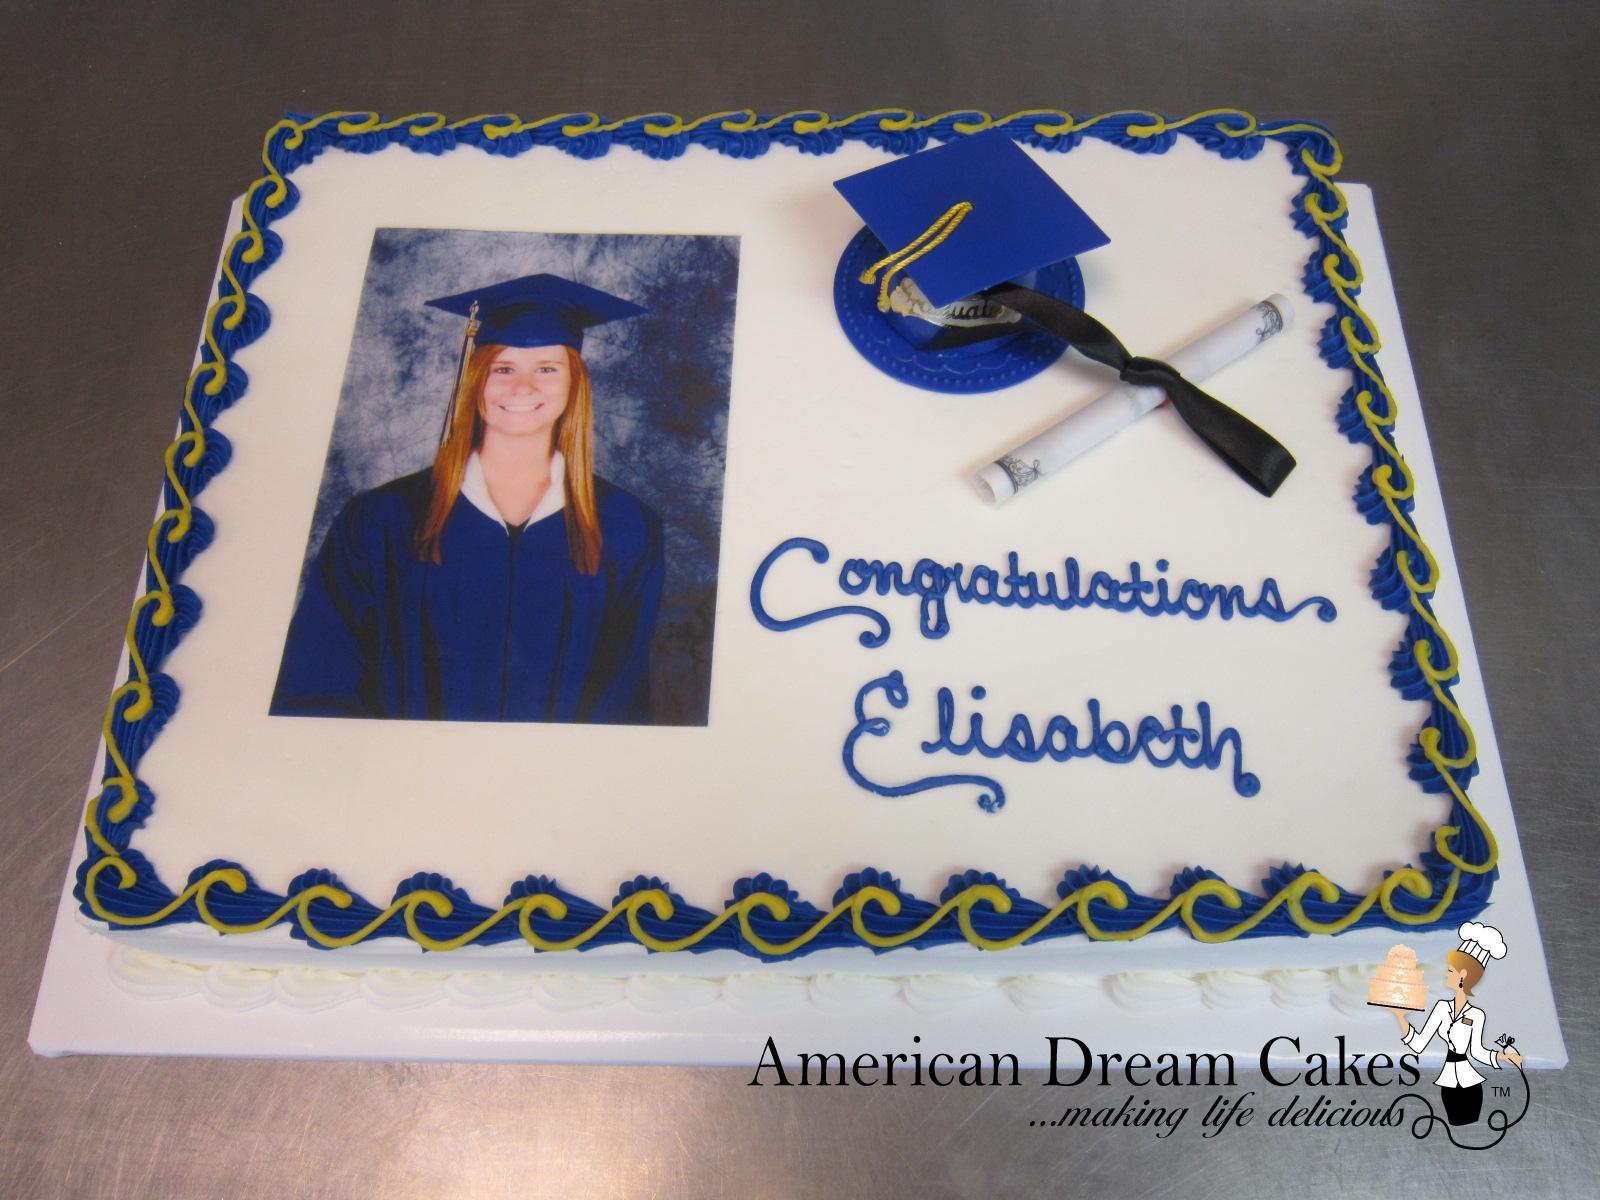 American Wedding Cakes